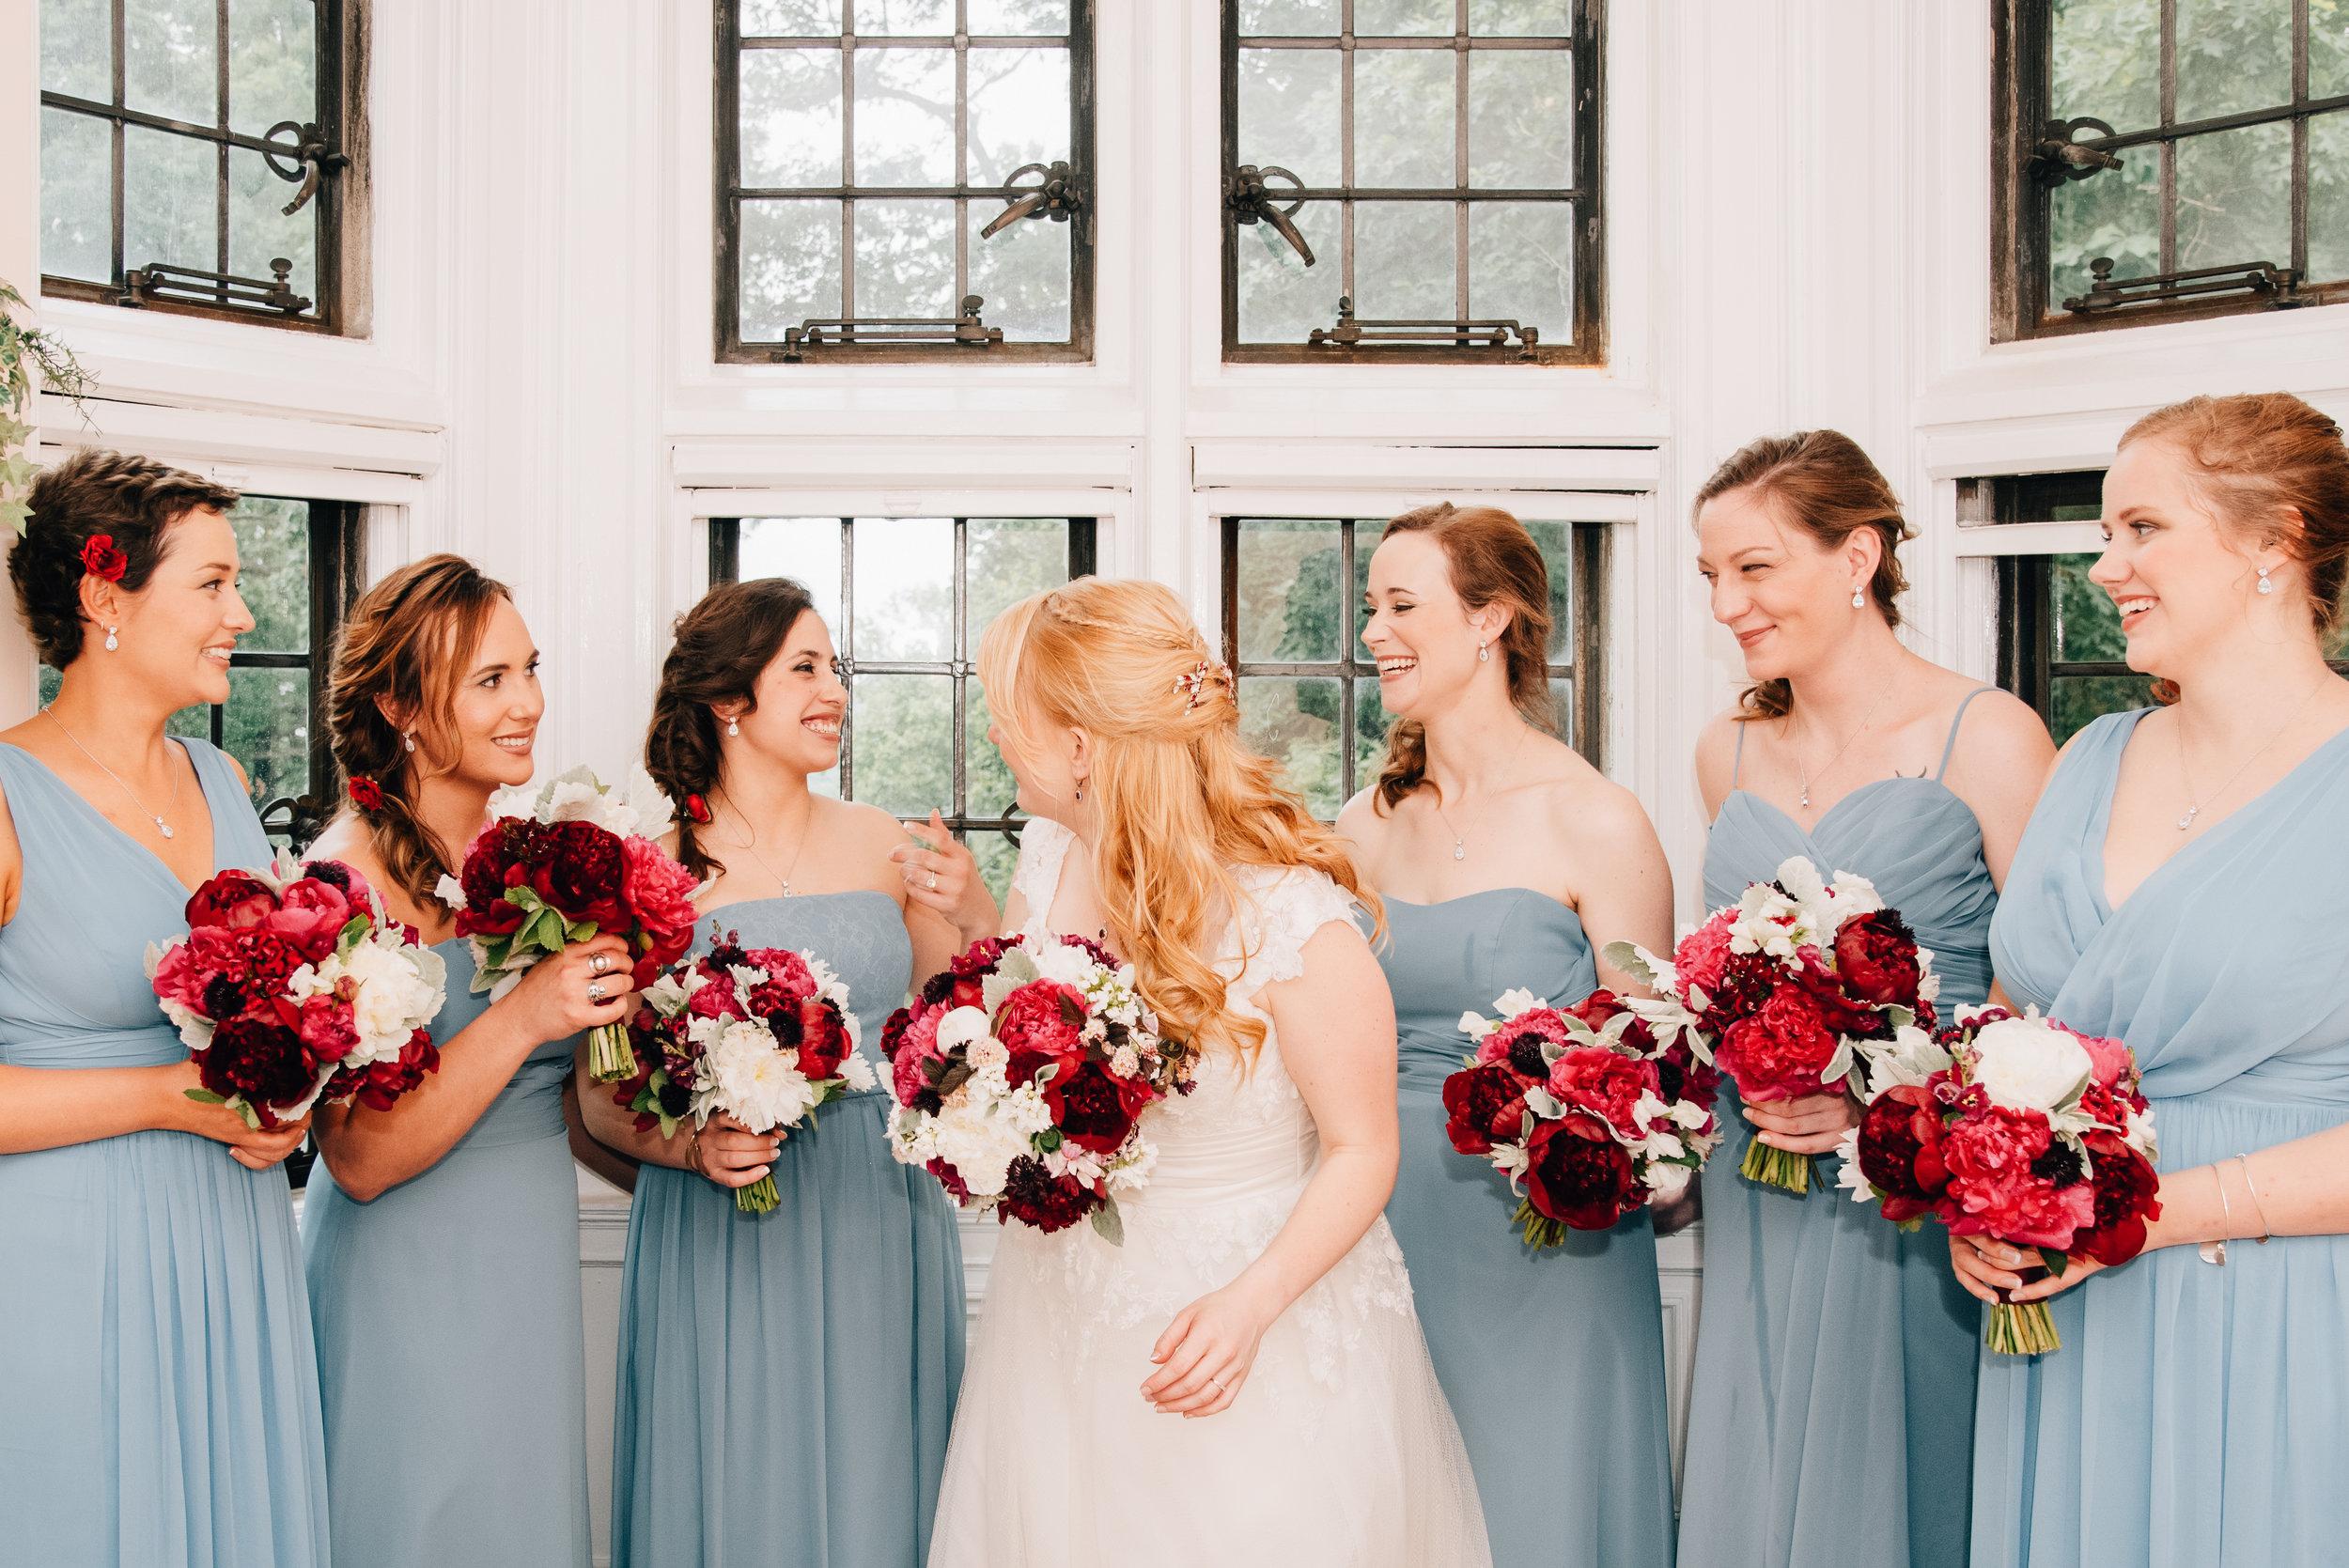 20180828_weddingwebsite_small_11.jpg